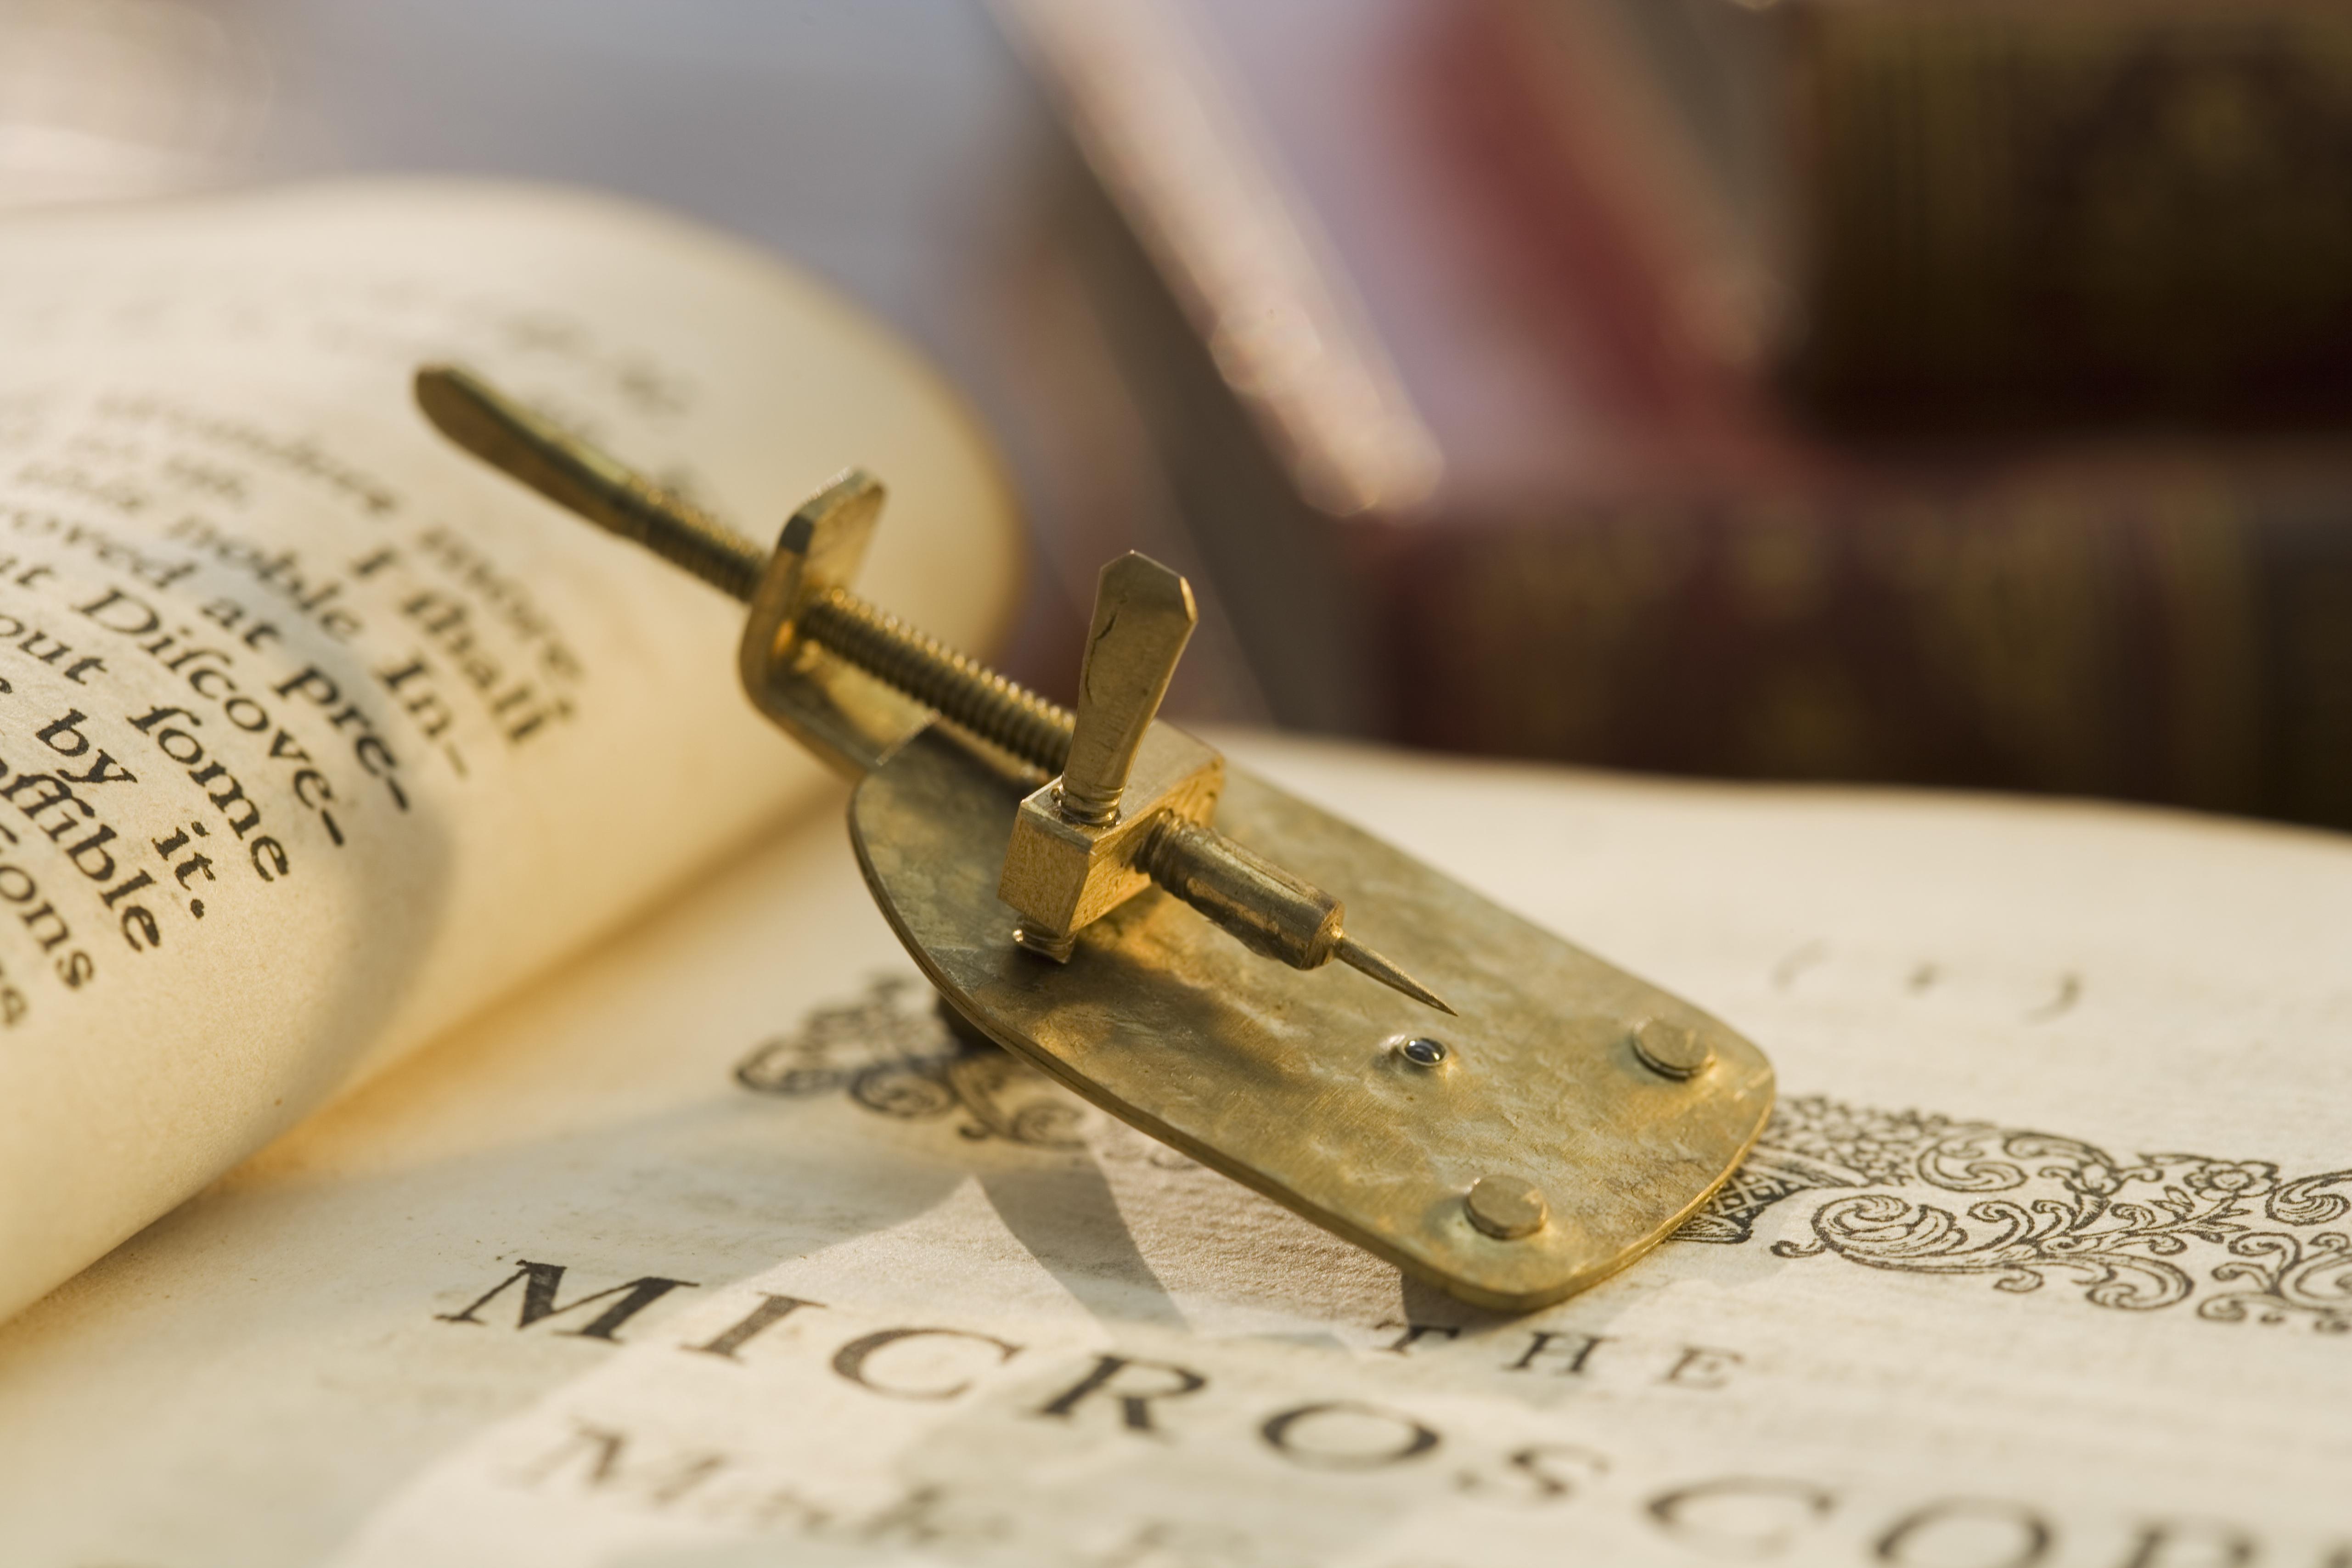 Appreciating van Leeuwenhoek: The Cloth Merchant Who Discovered Microbes